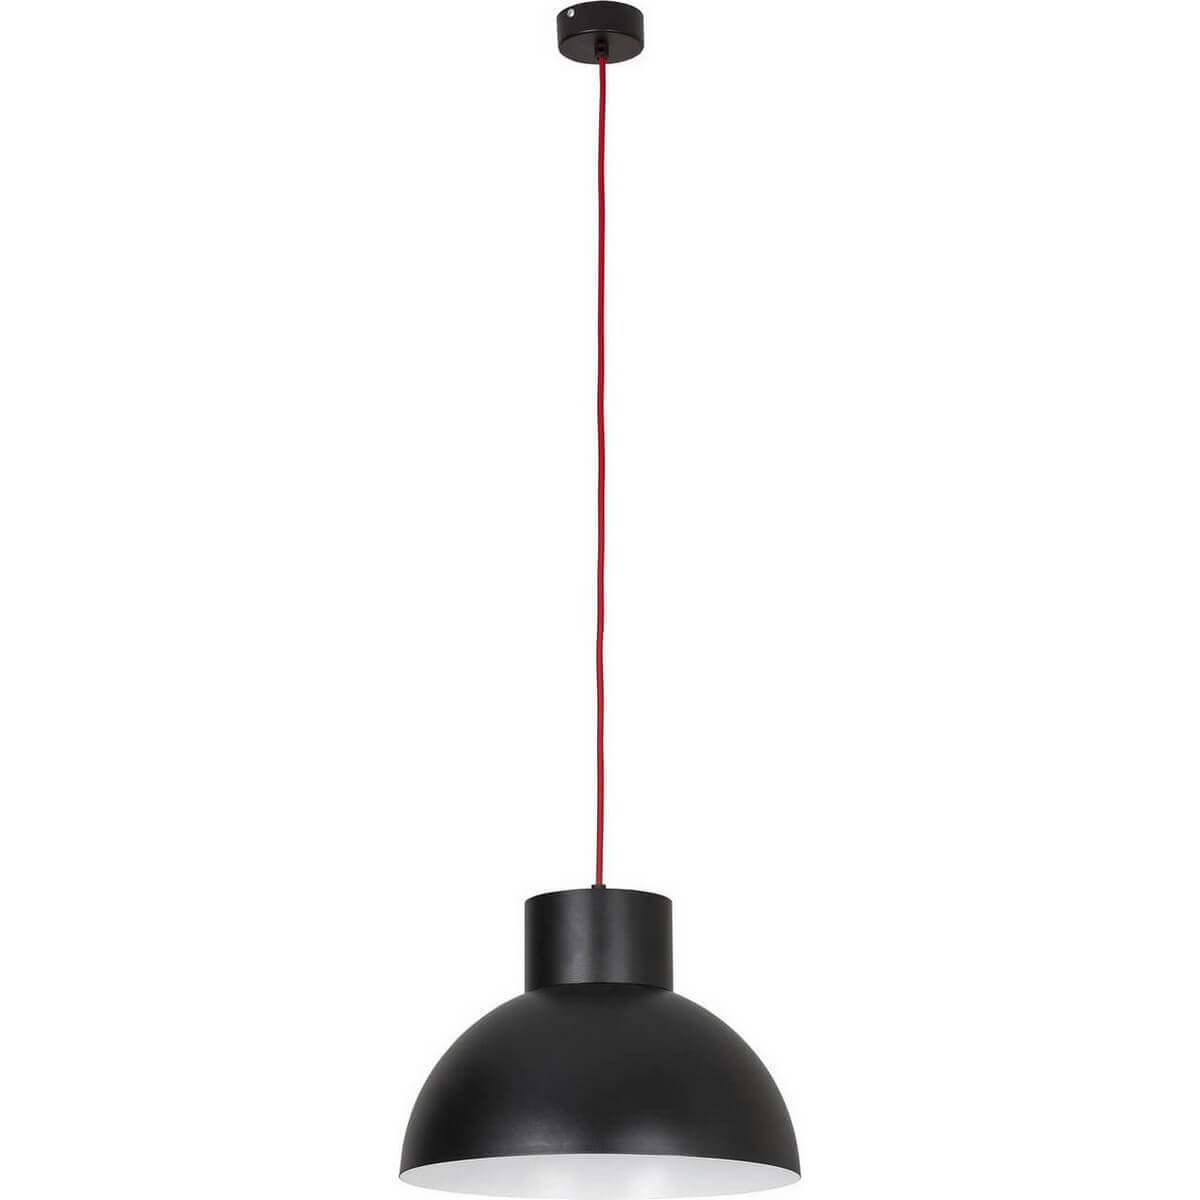 Светильник Nowodvorski 6507 Works Black